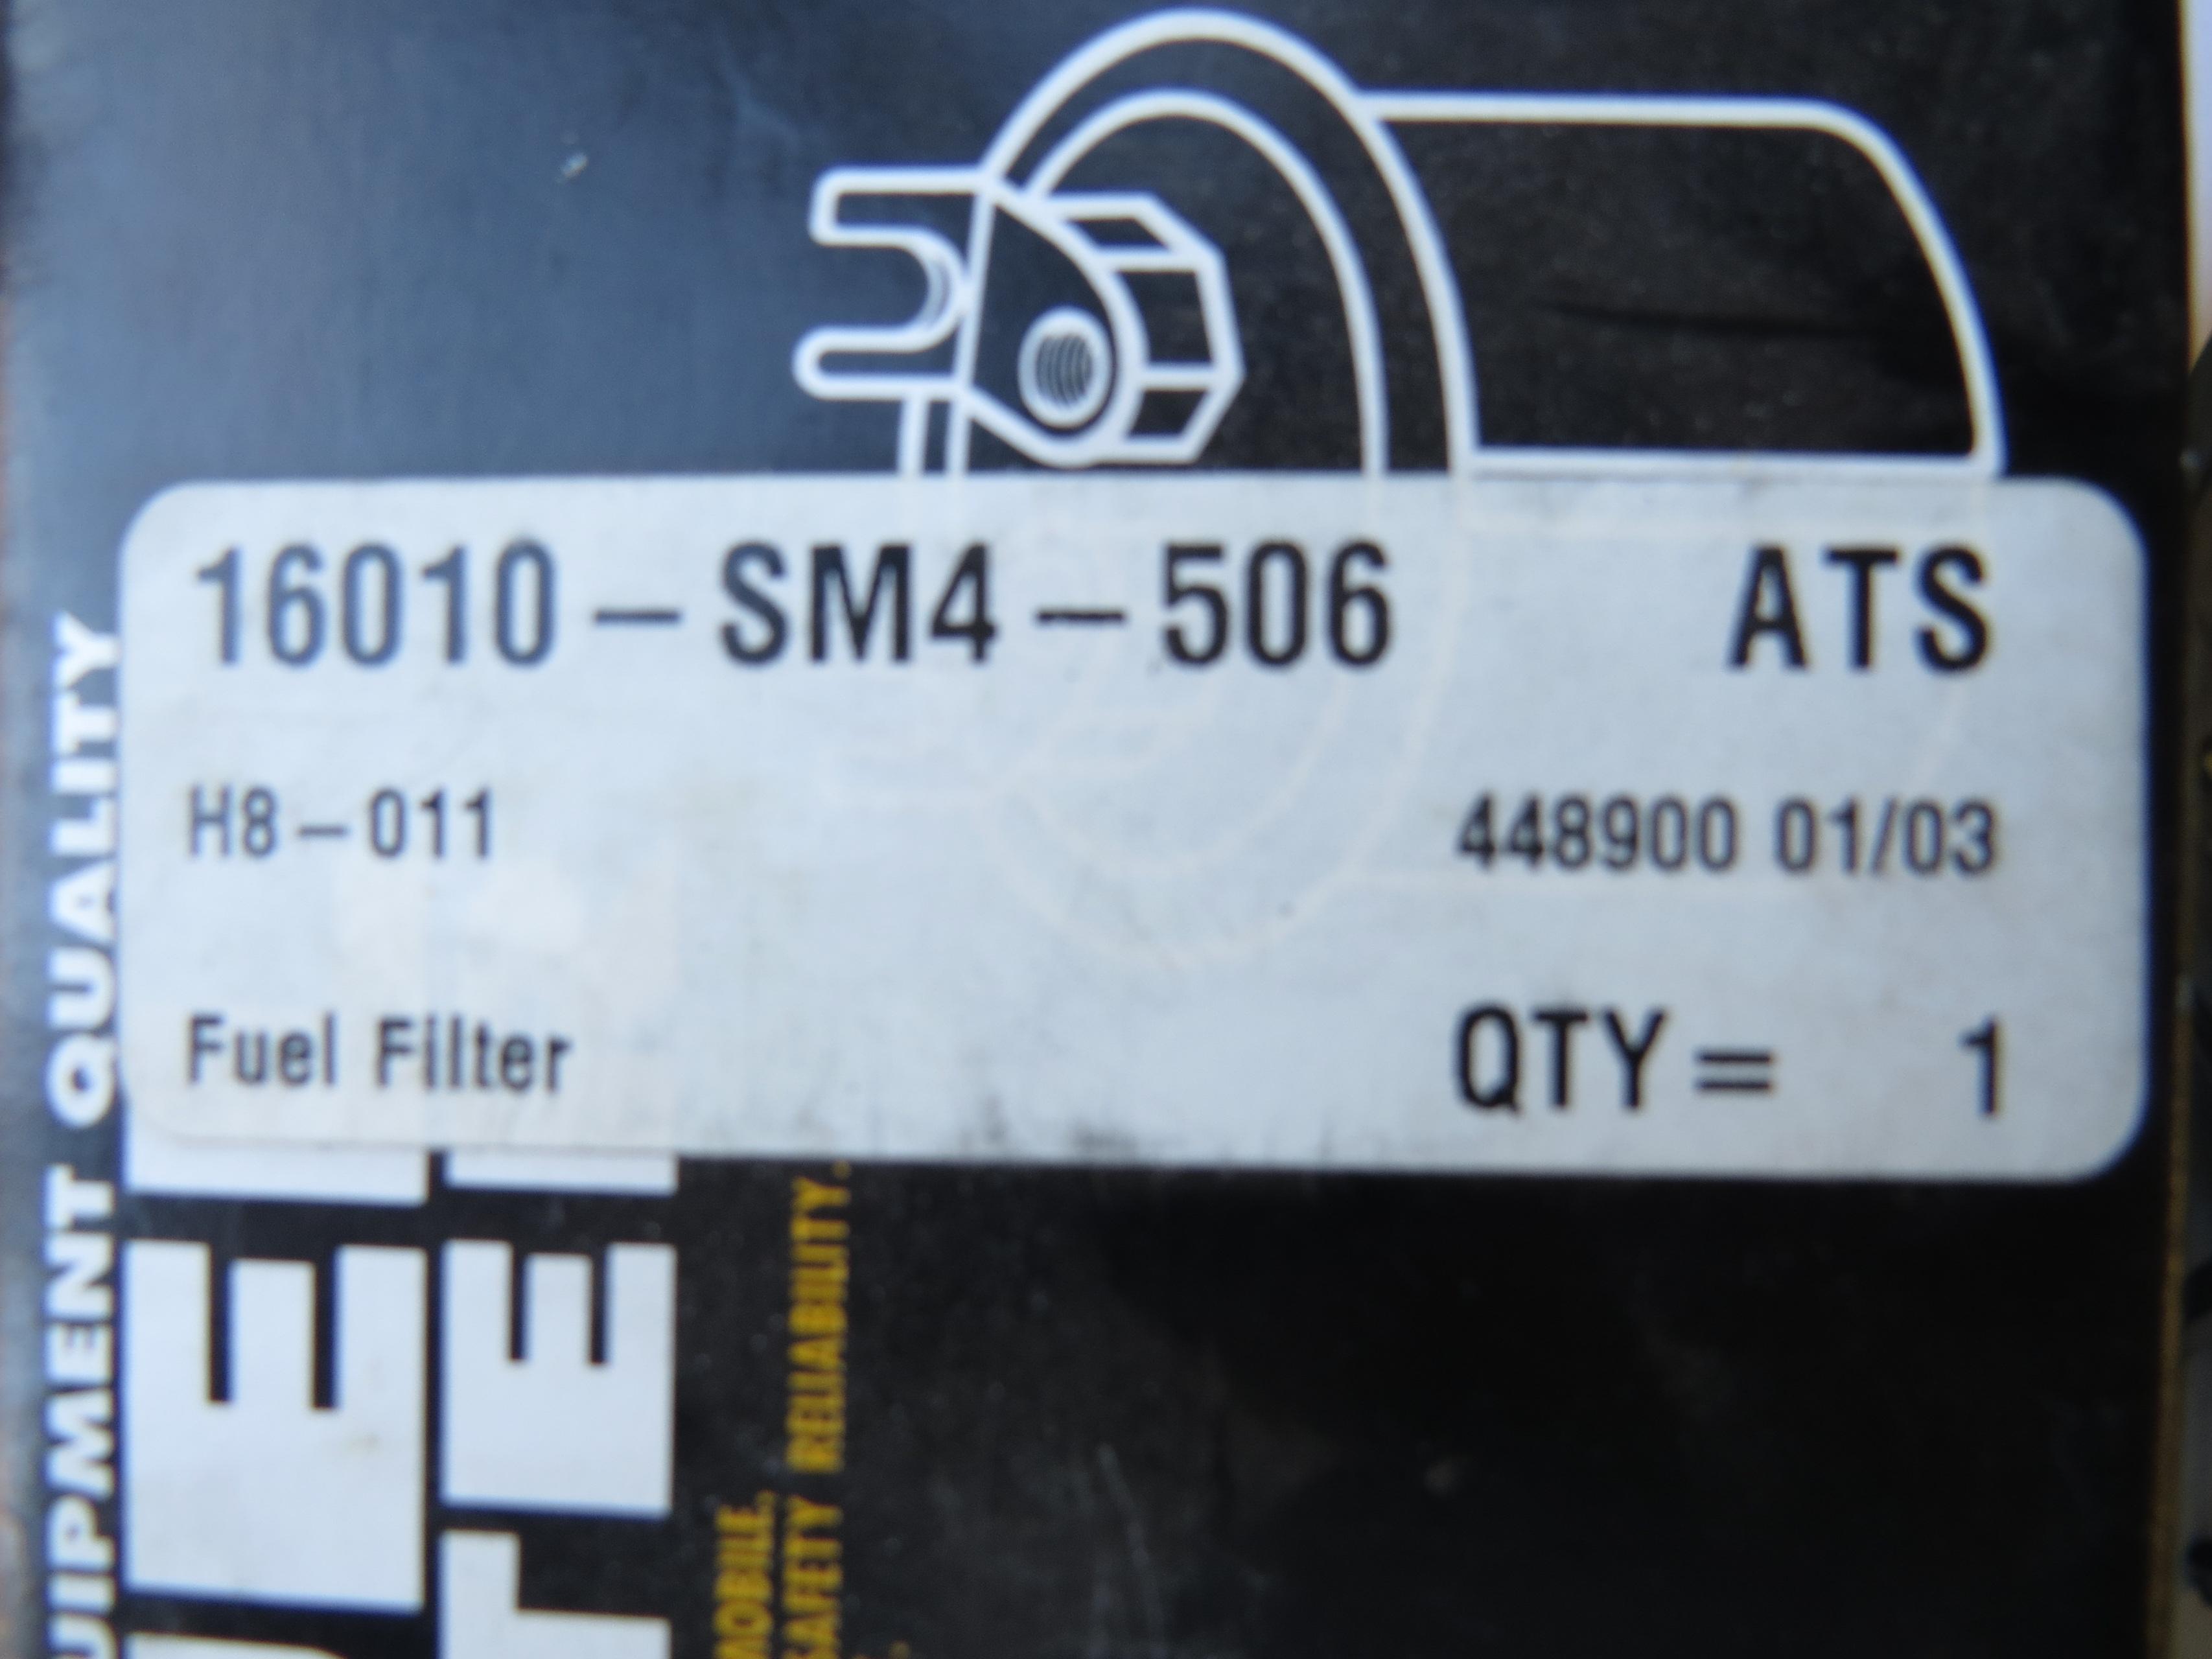 HONDA CIVIC ACCORD 1990-1994 FUEL FILTER 16010SM4506 on